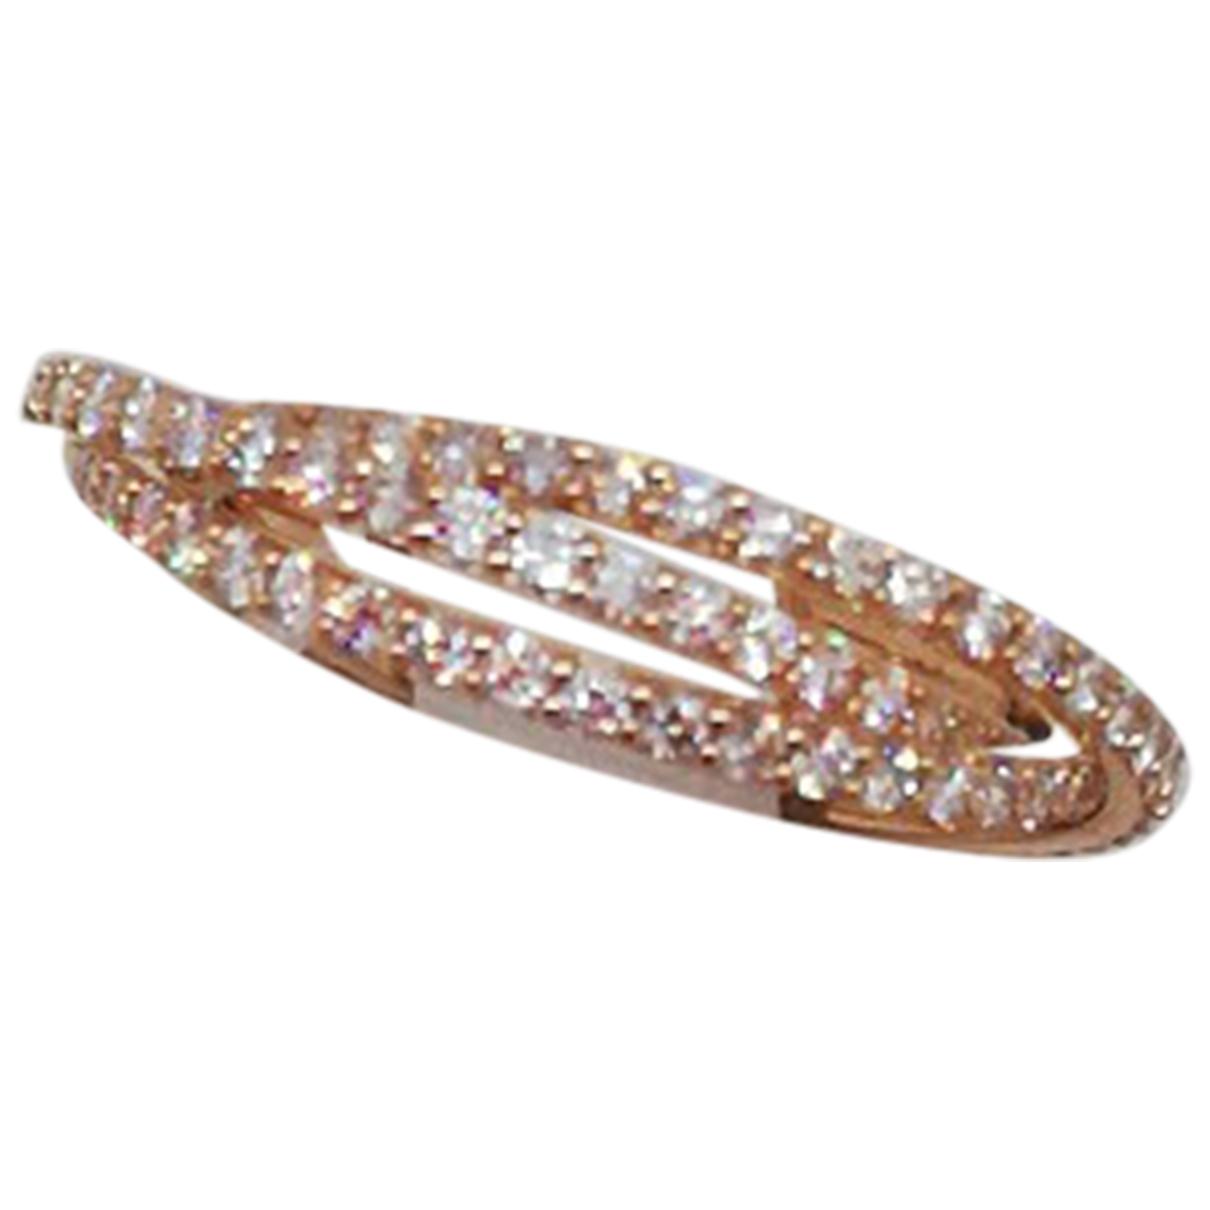 Davite & Delucchi - Bague   pour femme en or rose - dore